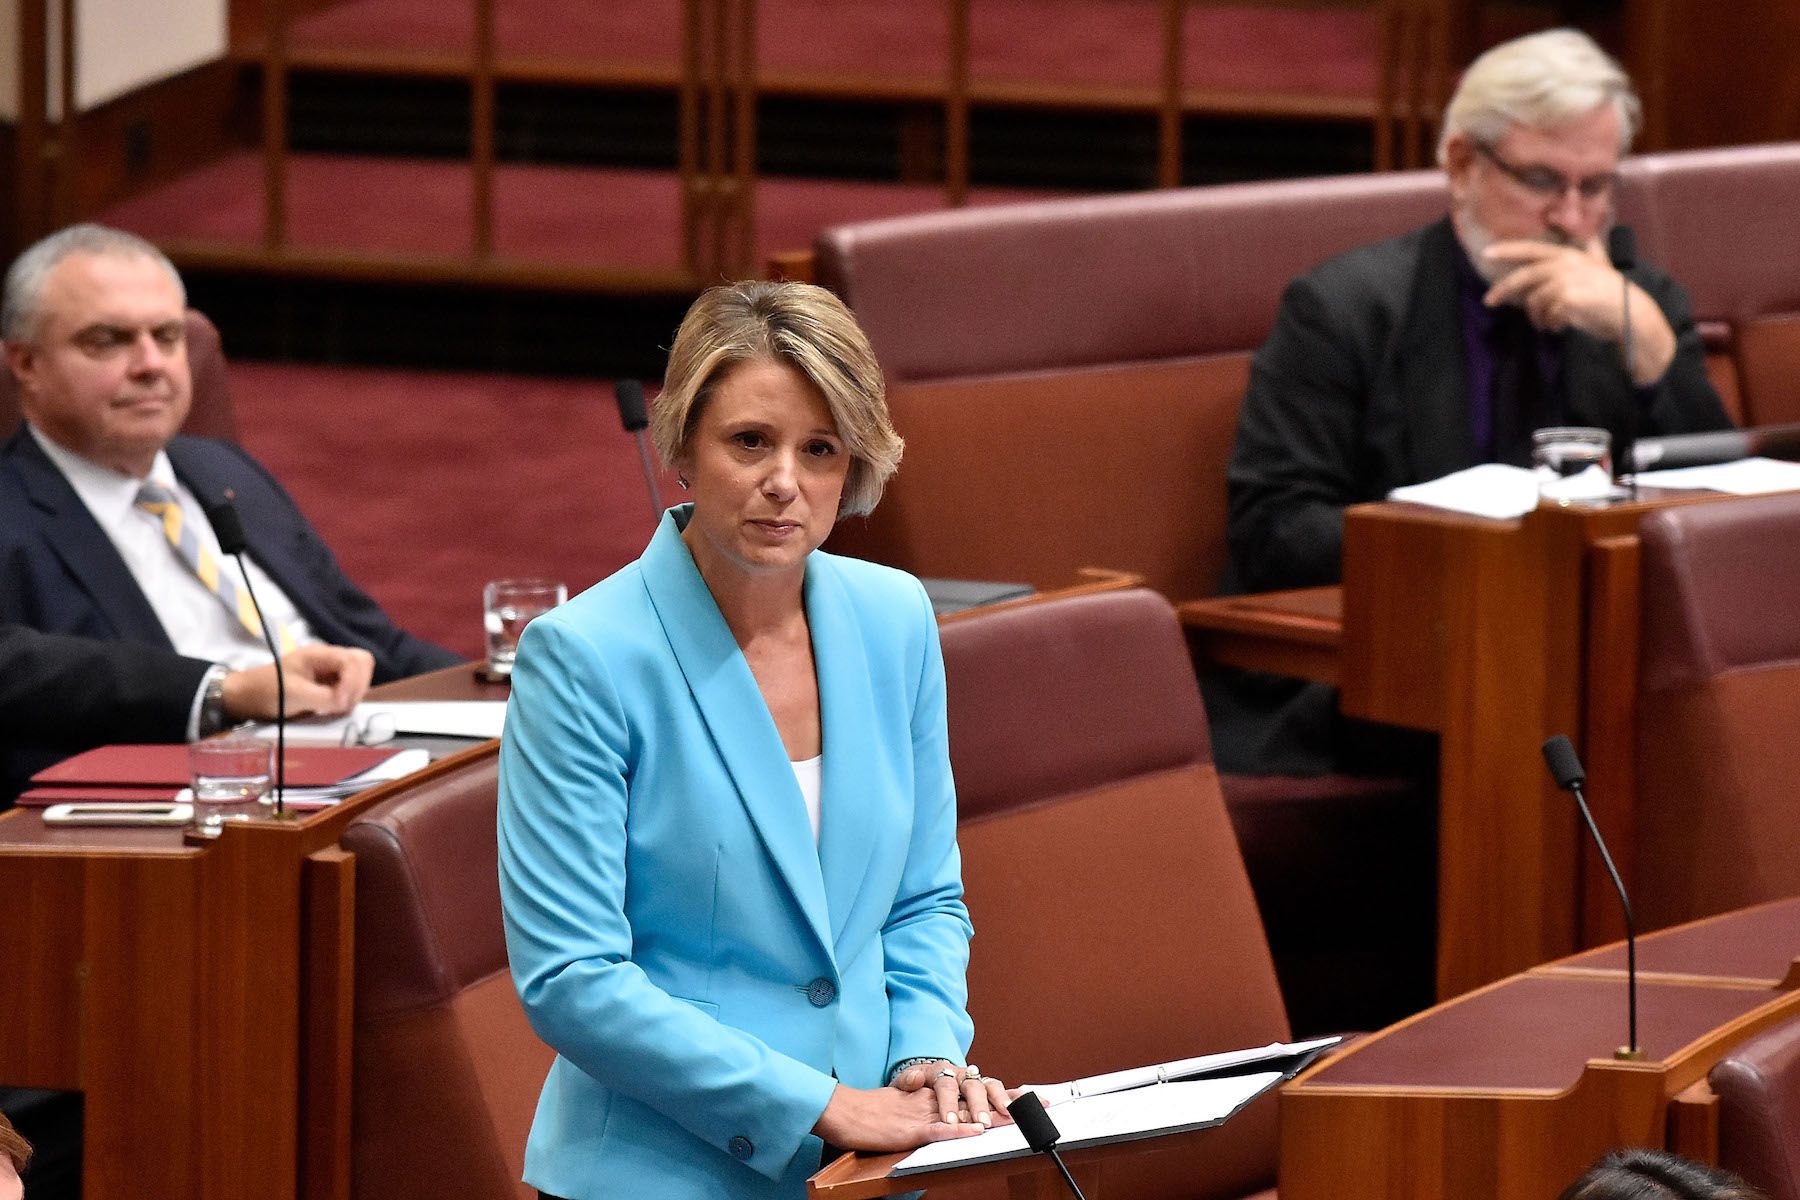 Kristina Keneally Delivers Maiden Senate Speech